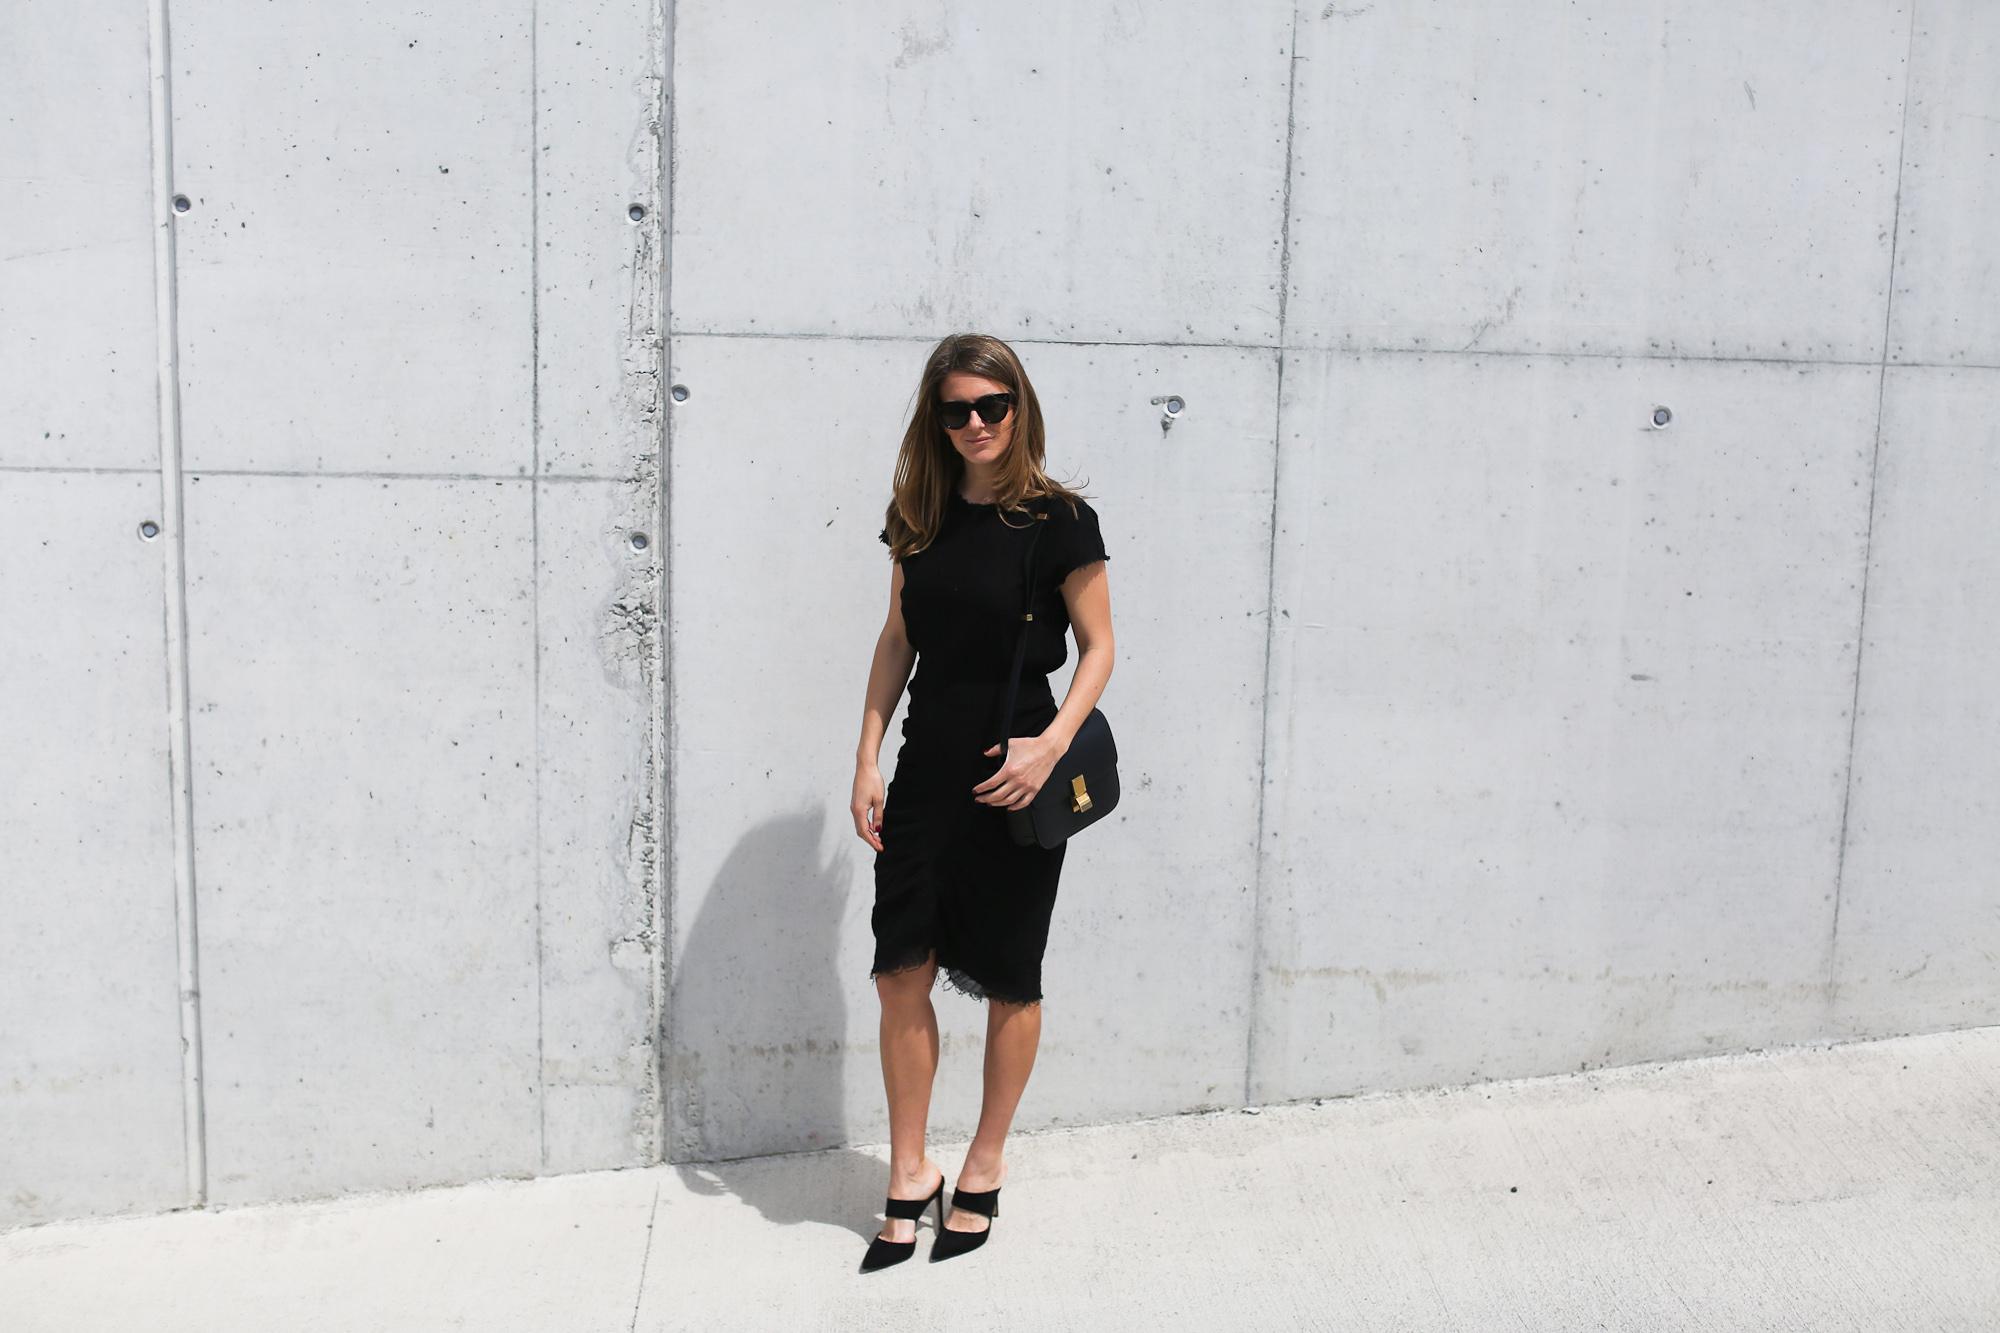 Clochet_streetstyle_masscob_villa_linen_dress_trimmerbilbao_celineboxbag-3